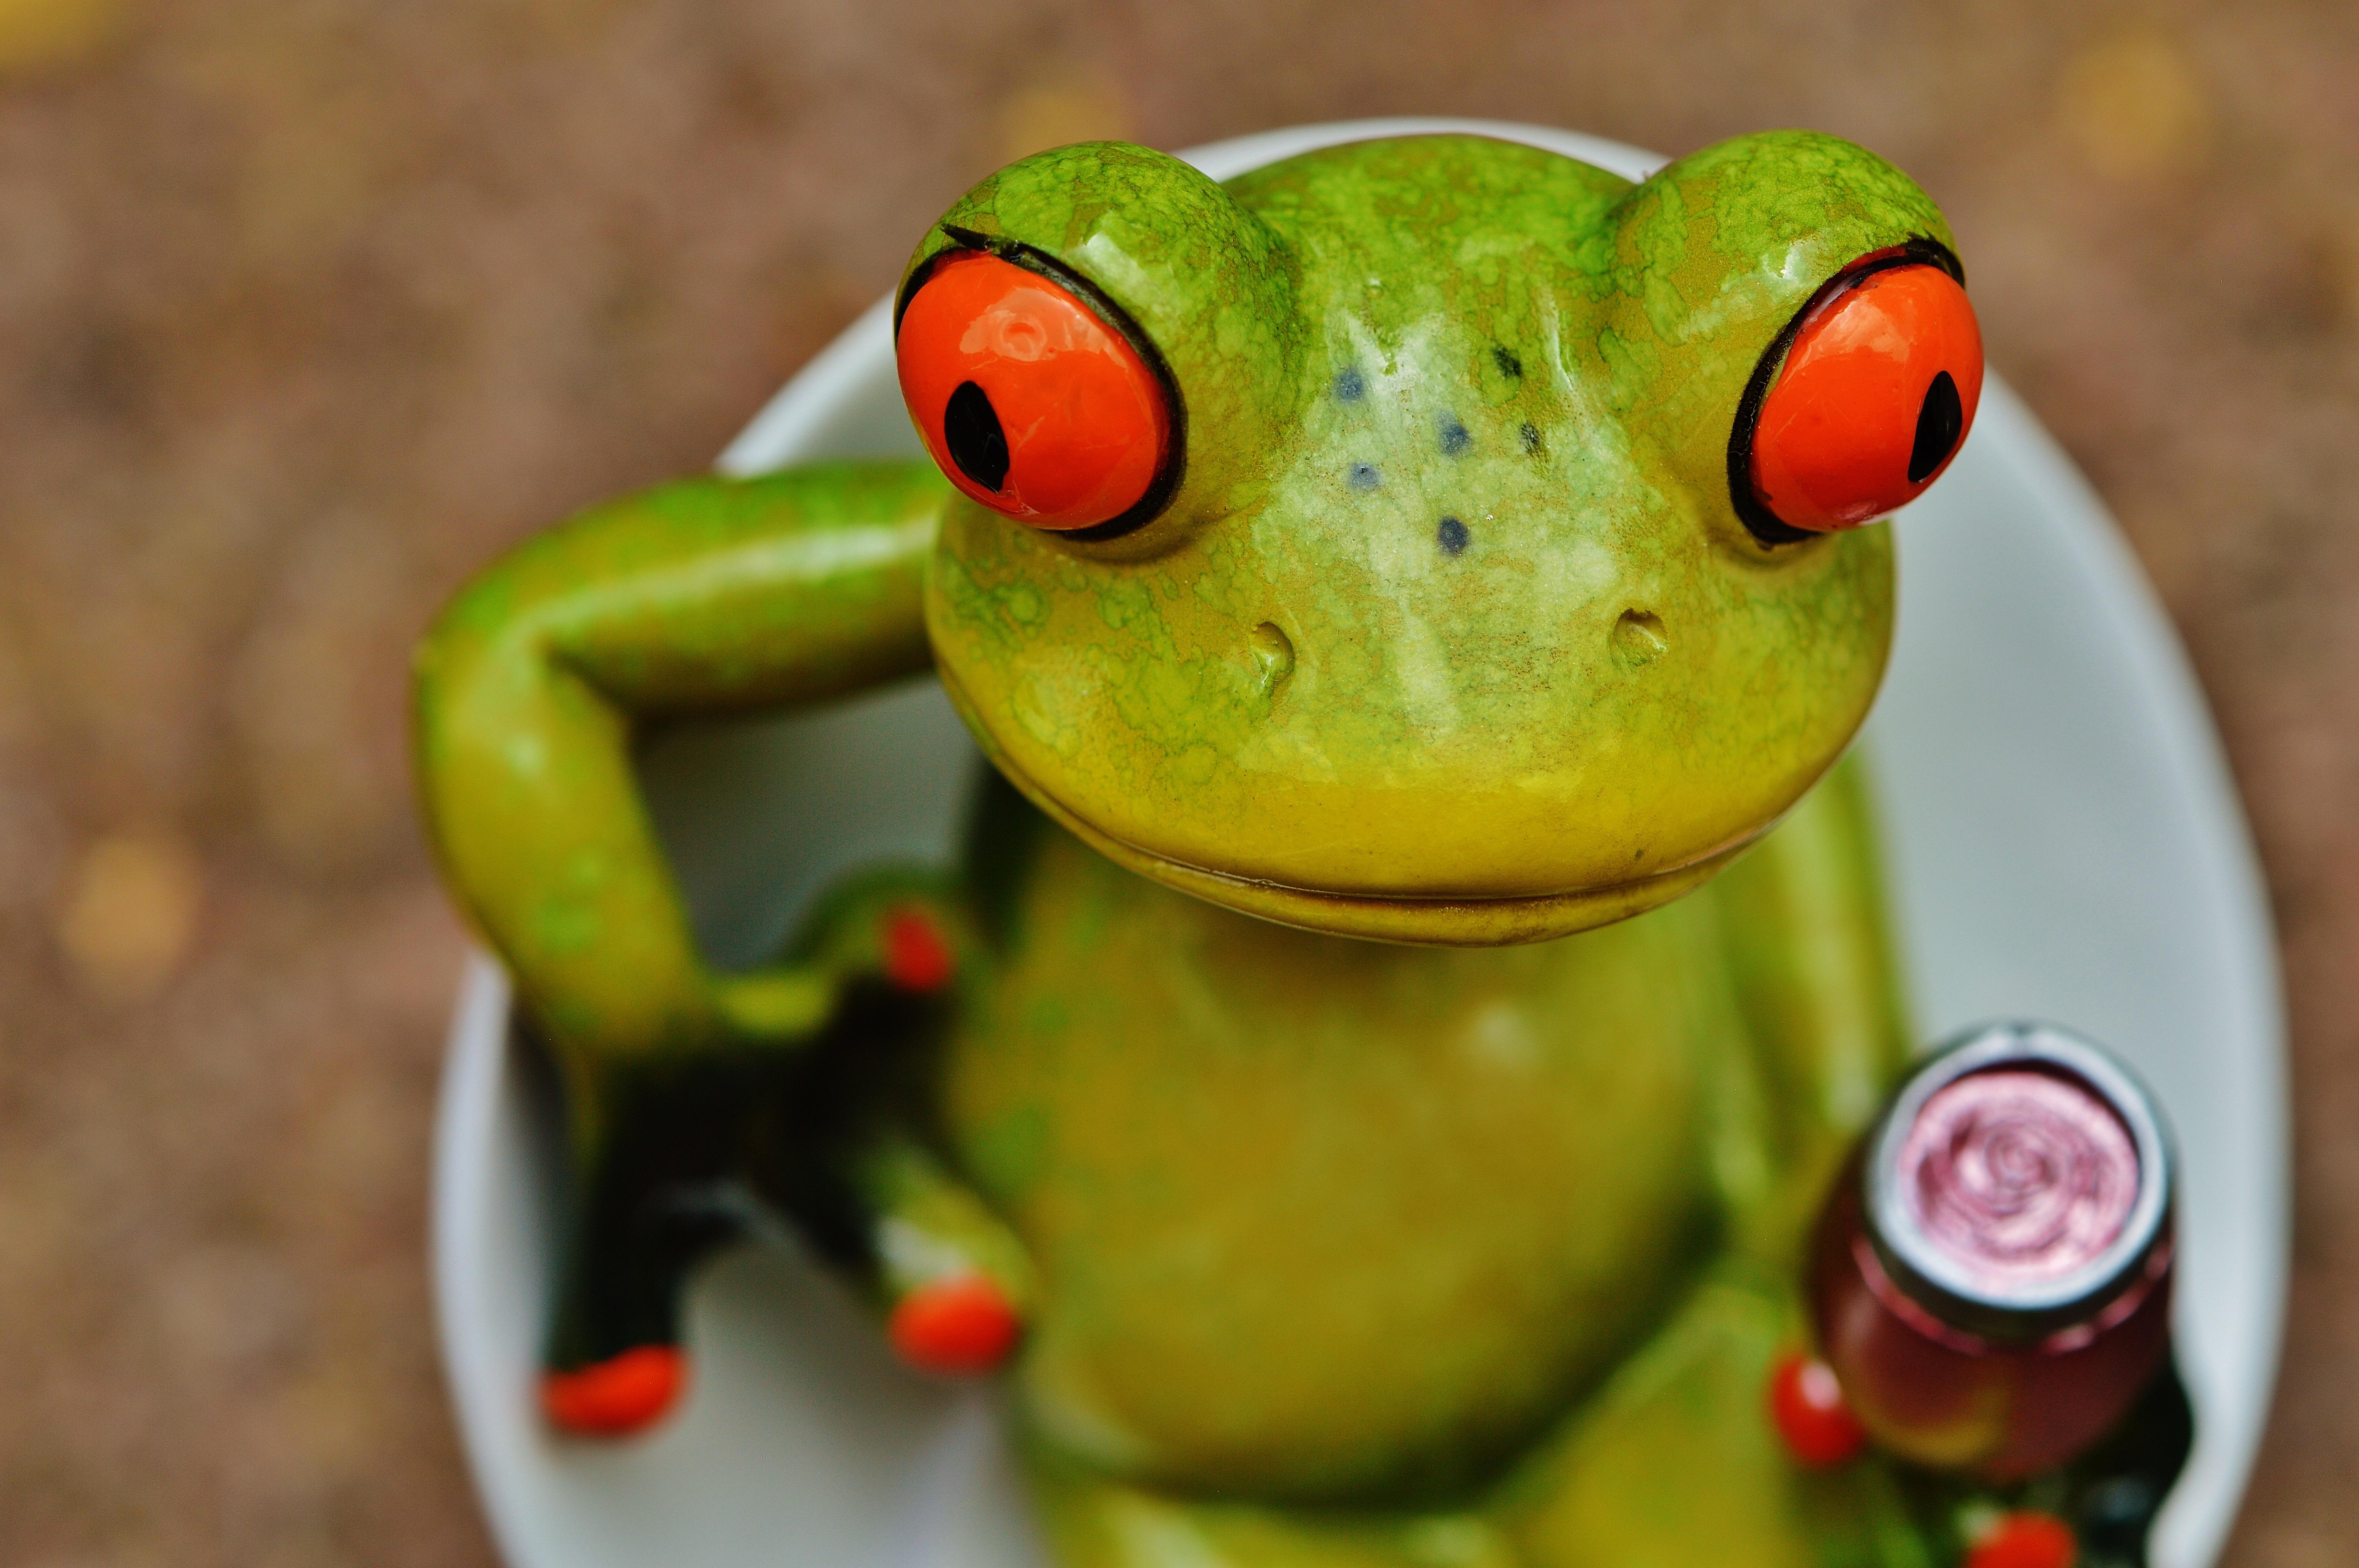 картинки лягушка пьет коктейль время необходимо для